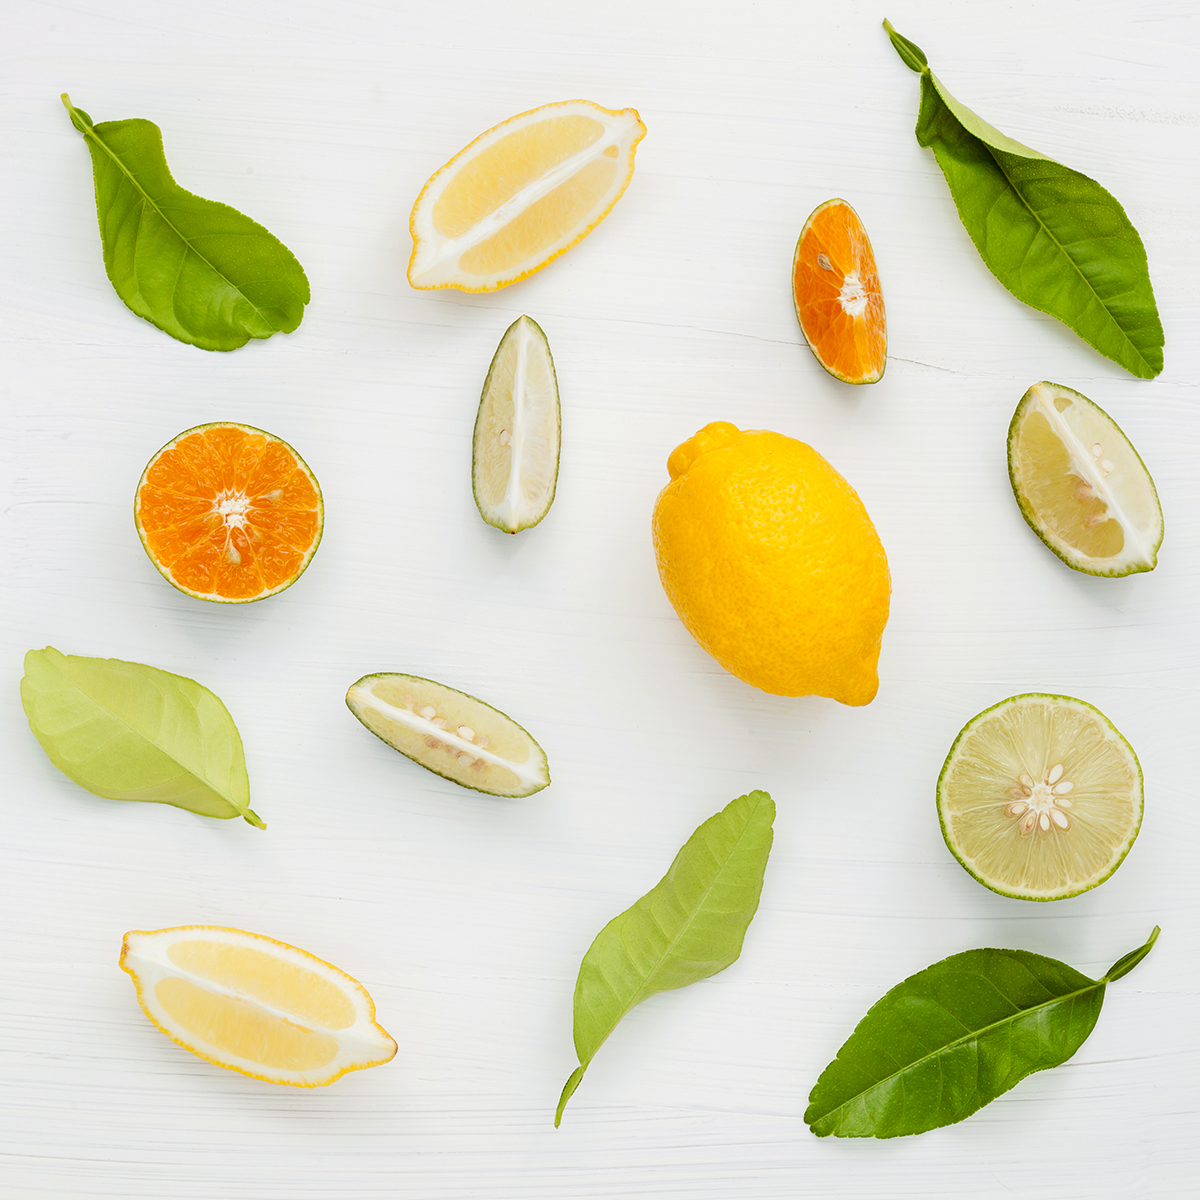 Mixed fresh citrus fruits and leaves background. Fresh lemons, lemon slice ,lime and orange on white wooden table with flat lay.